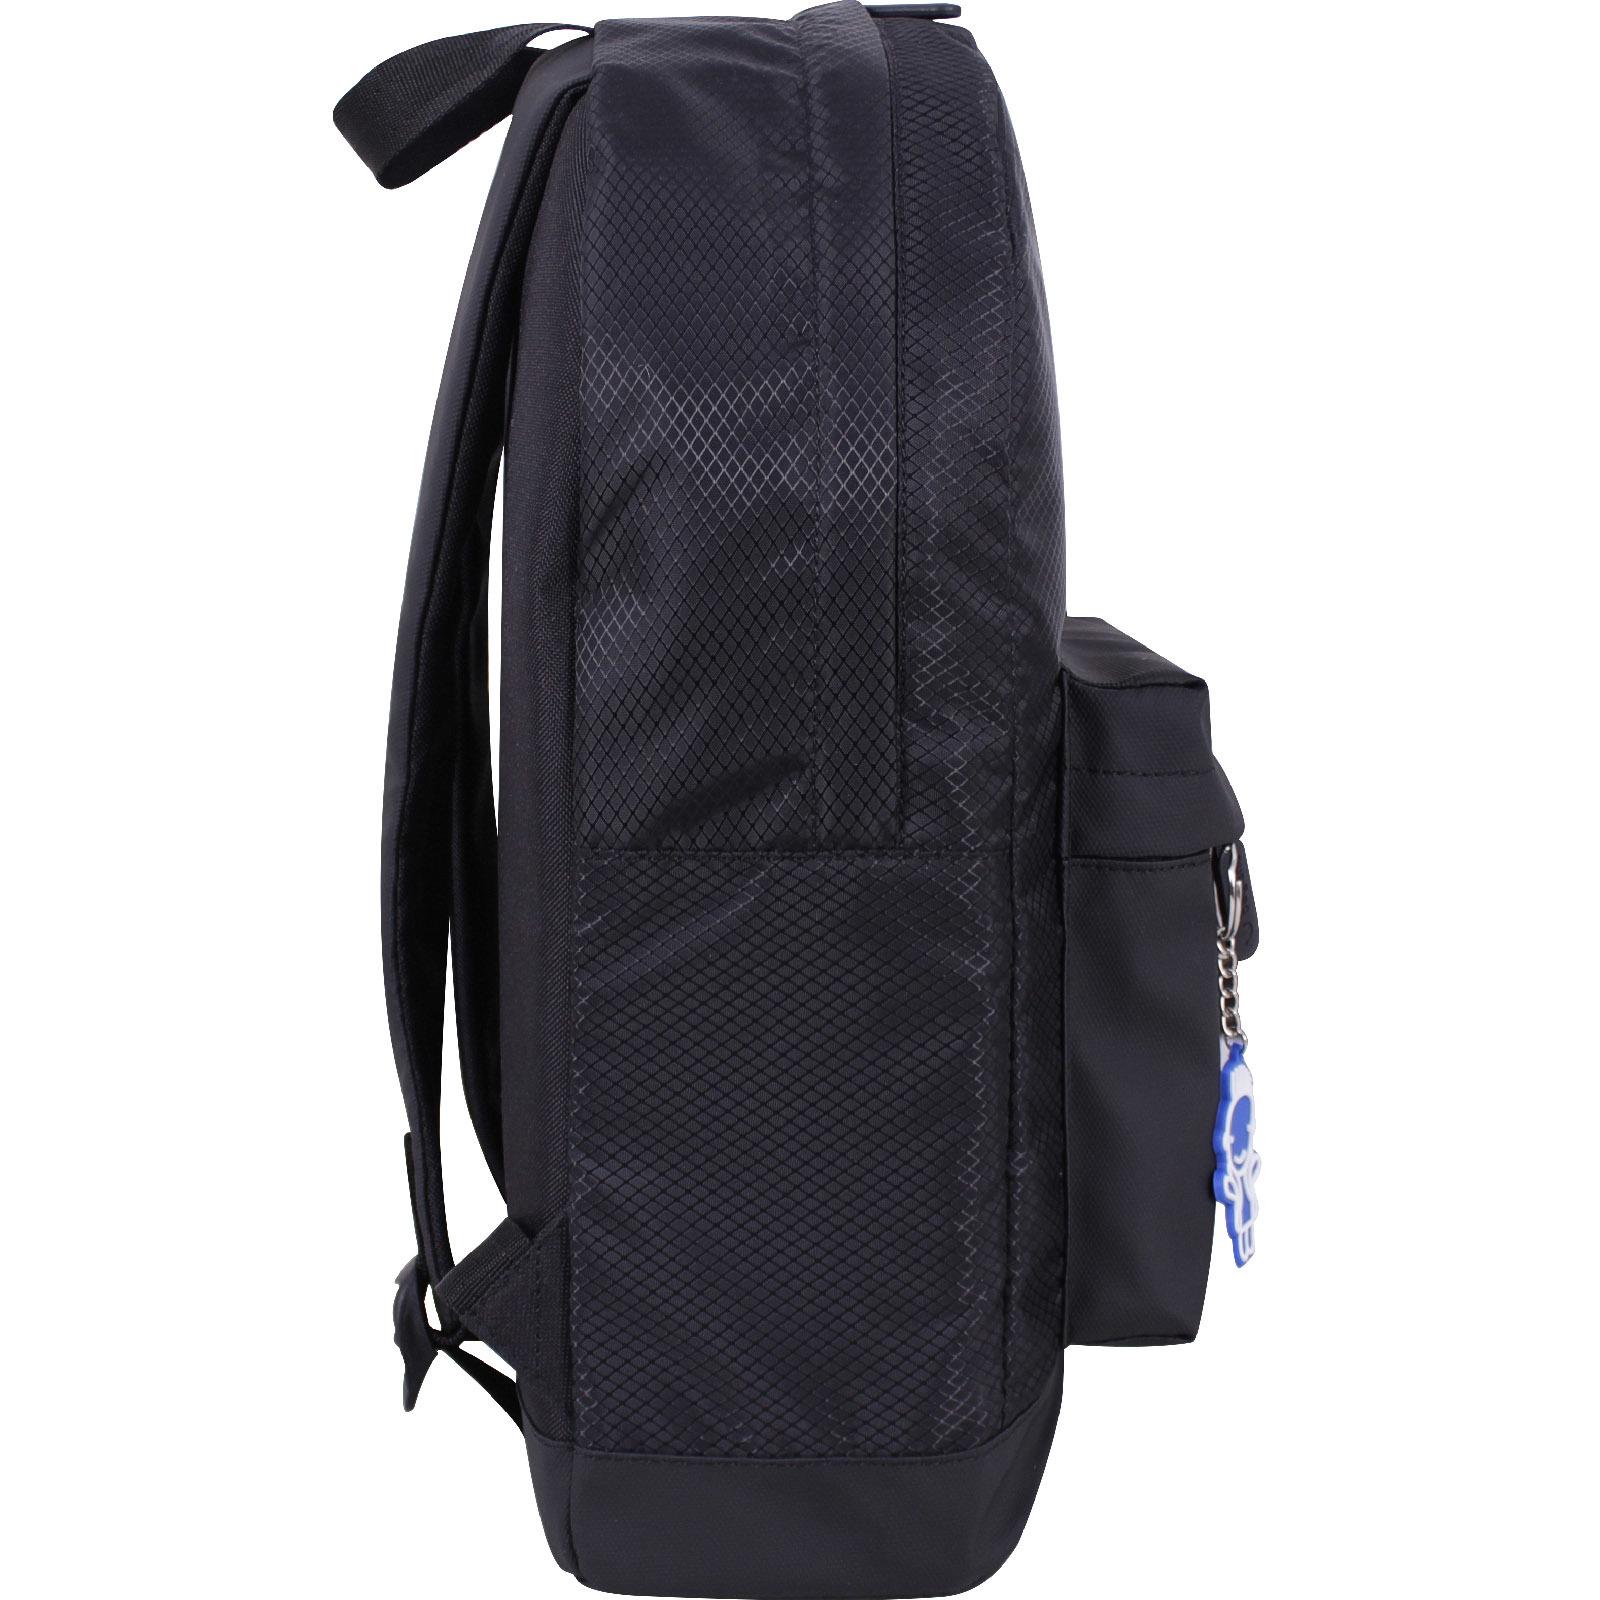 Рюкзак Bagland Молодежный W/R 17 л. чорний (00533332)